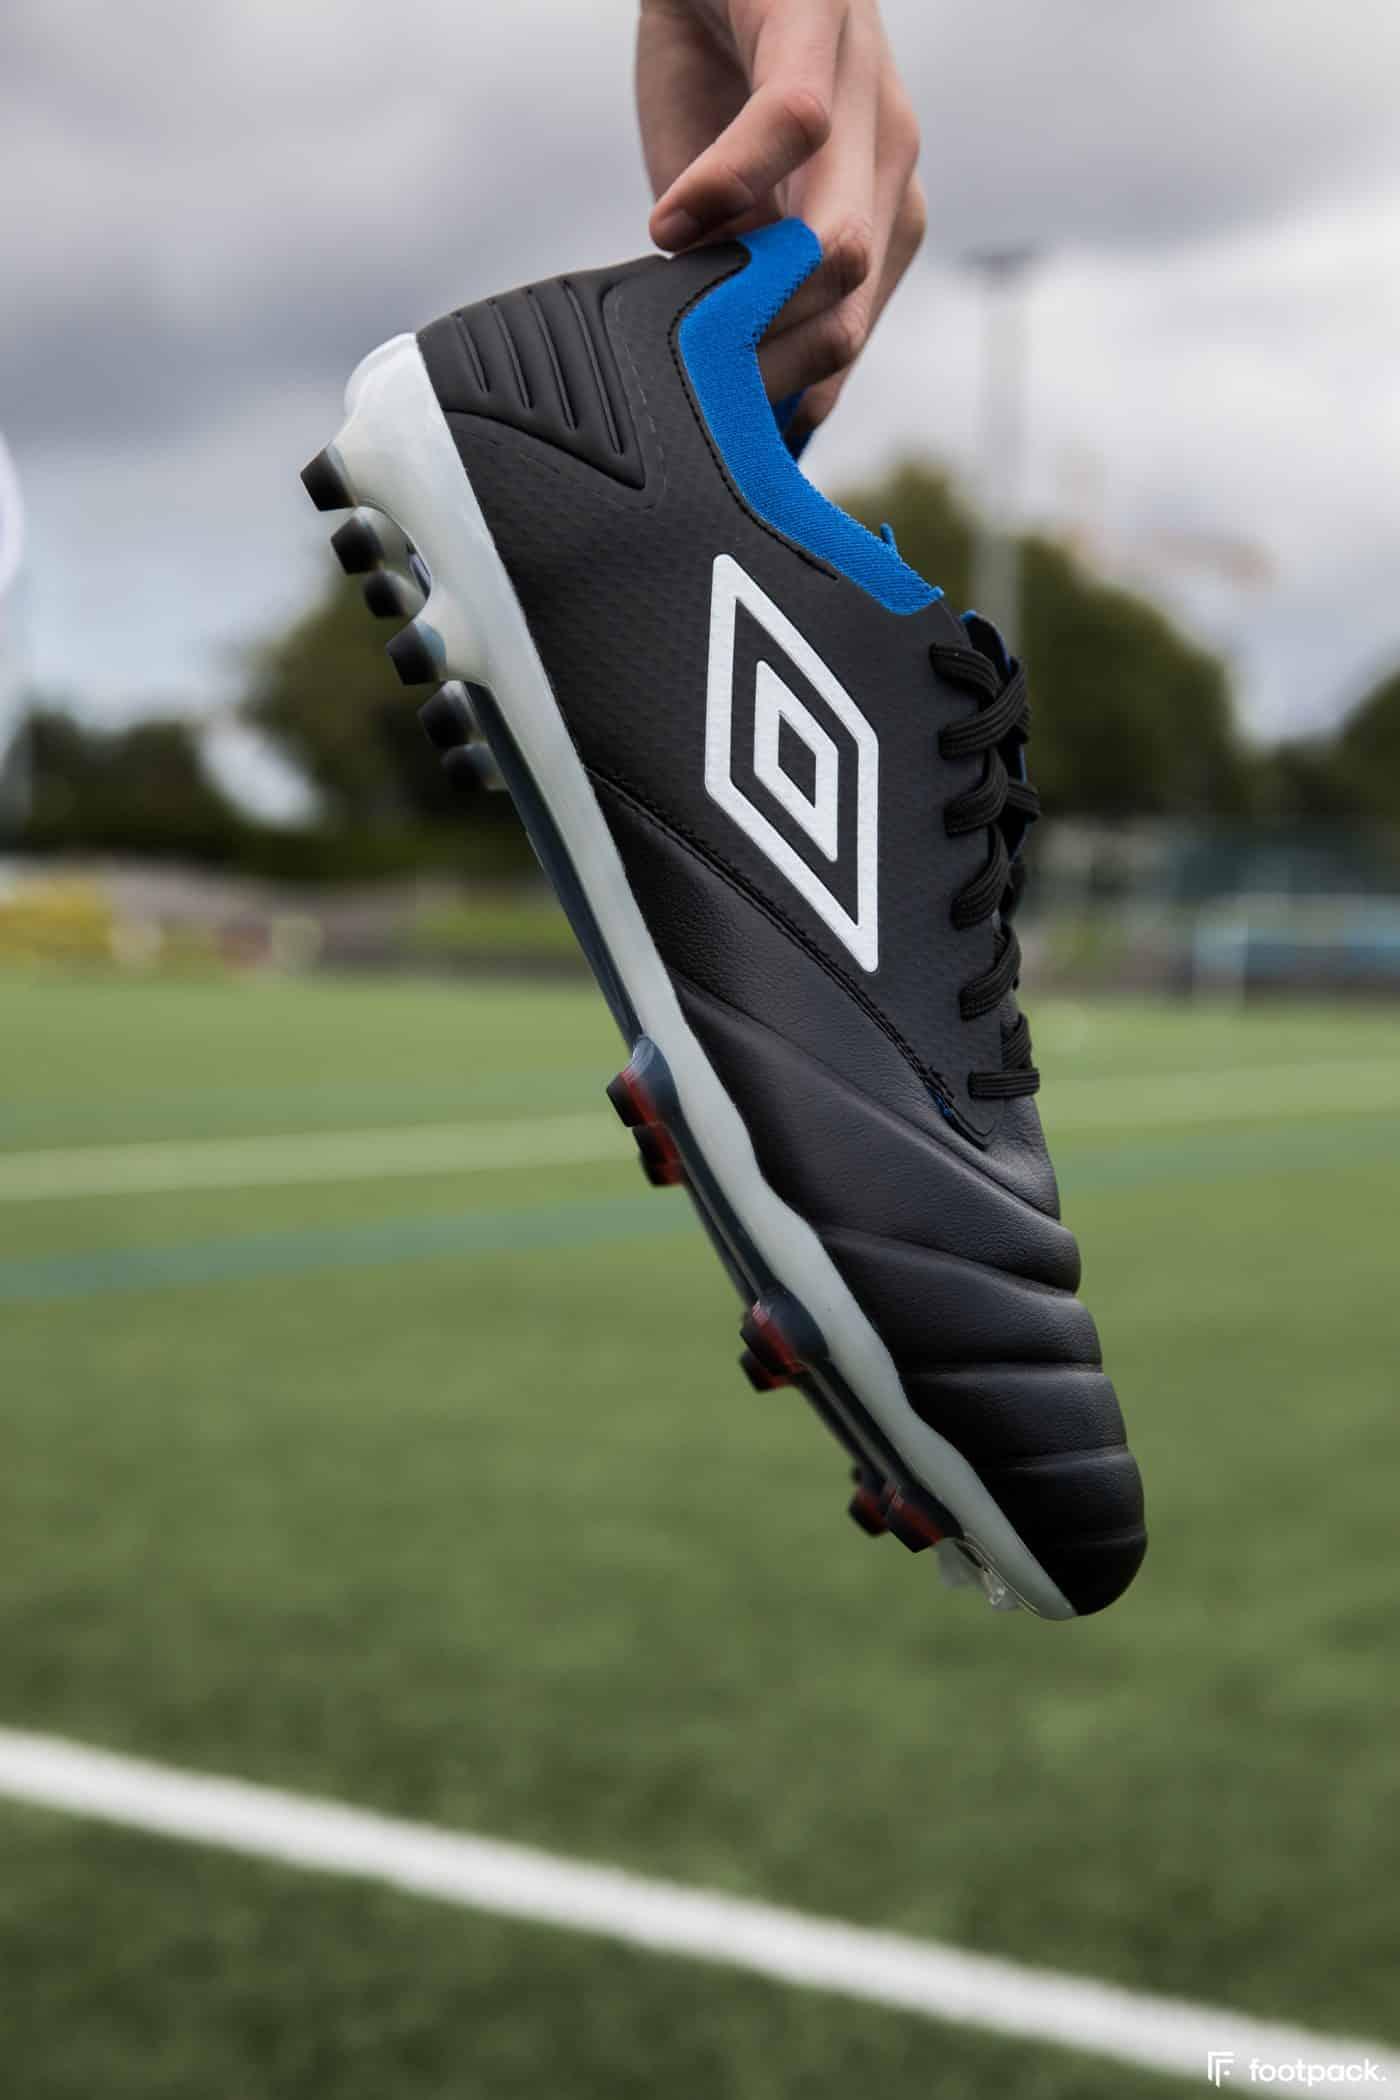 umbro-tocco-noir-bleu-2020-footpack-14